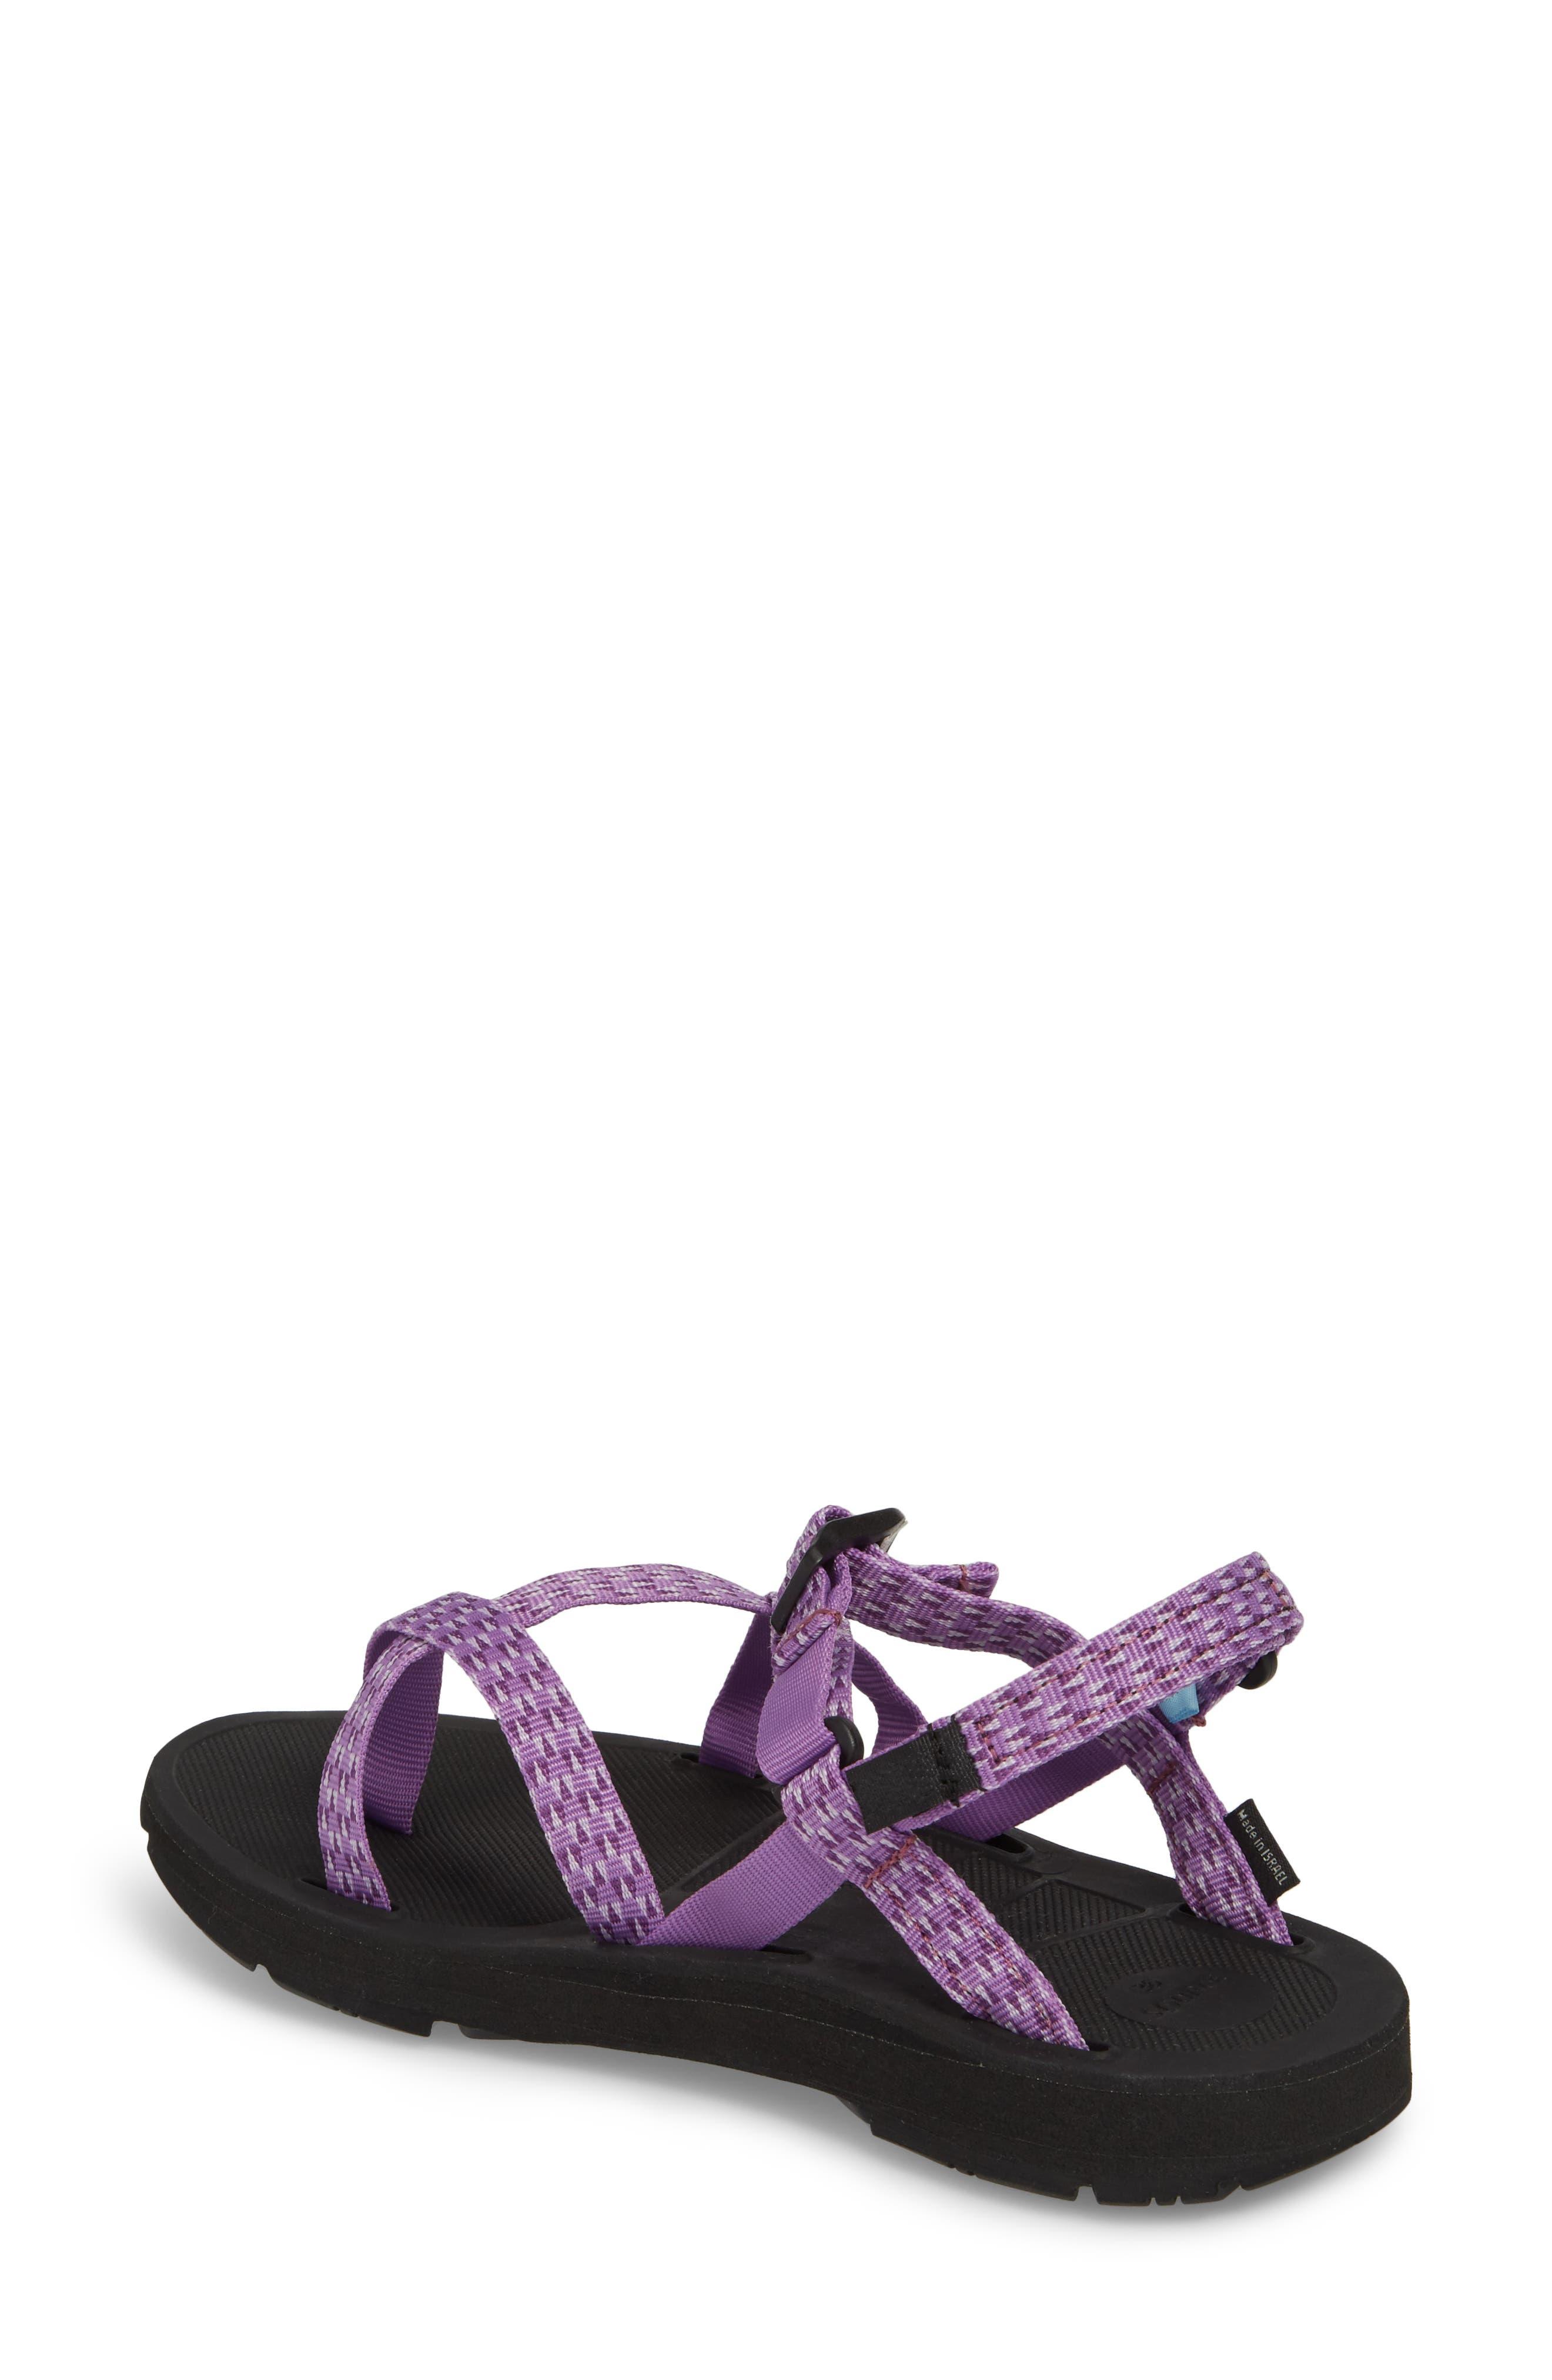 Shore Sandal,                             Alternate thumbnail 2, color,                             Purple Triangles Fabric